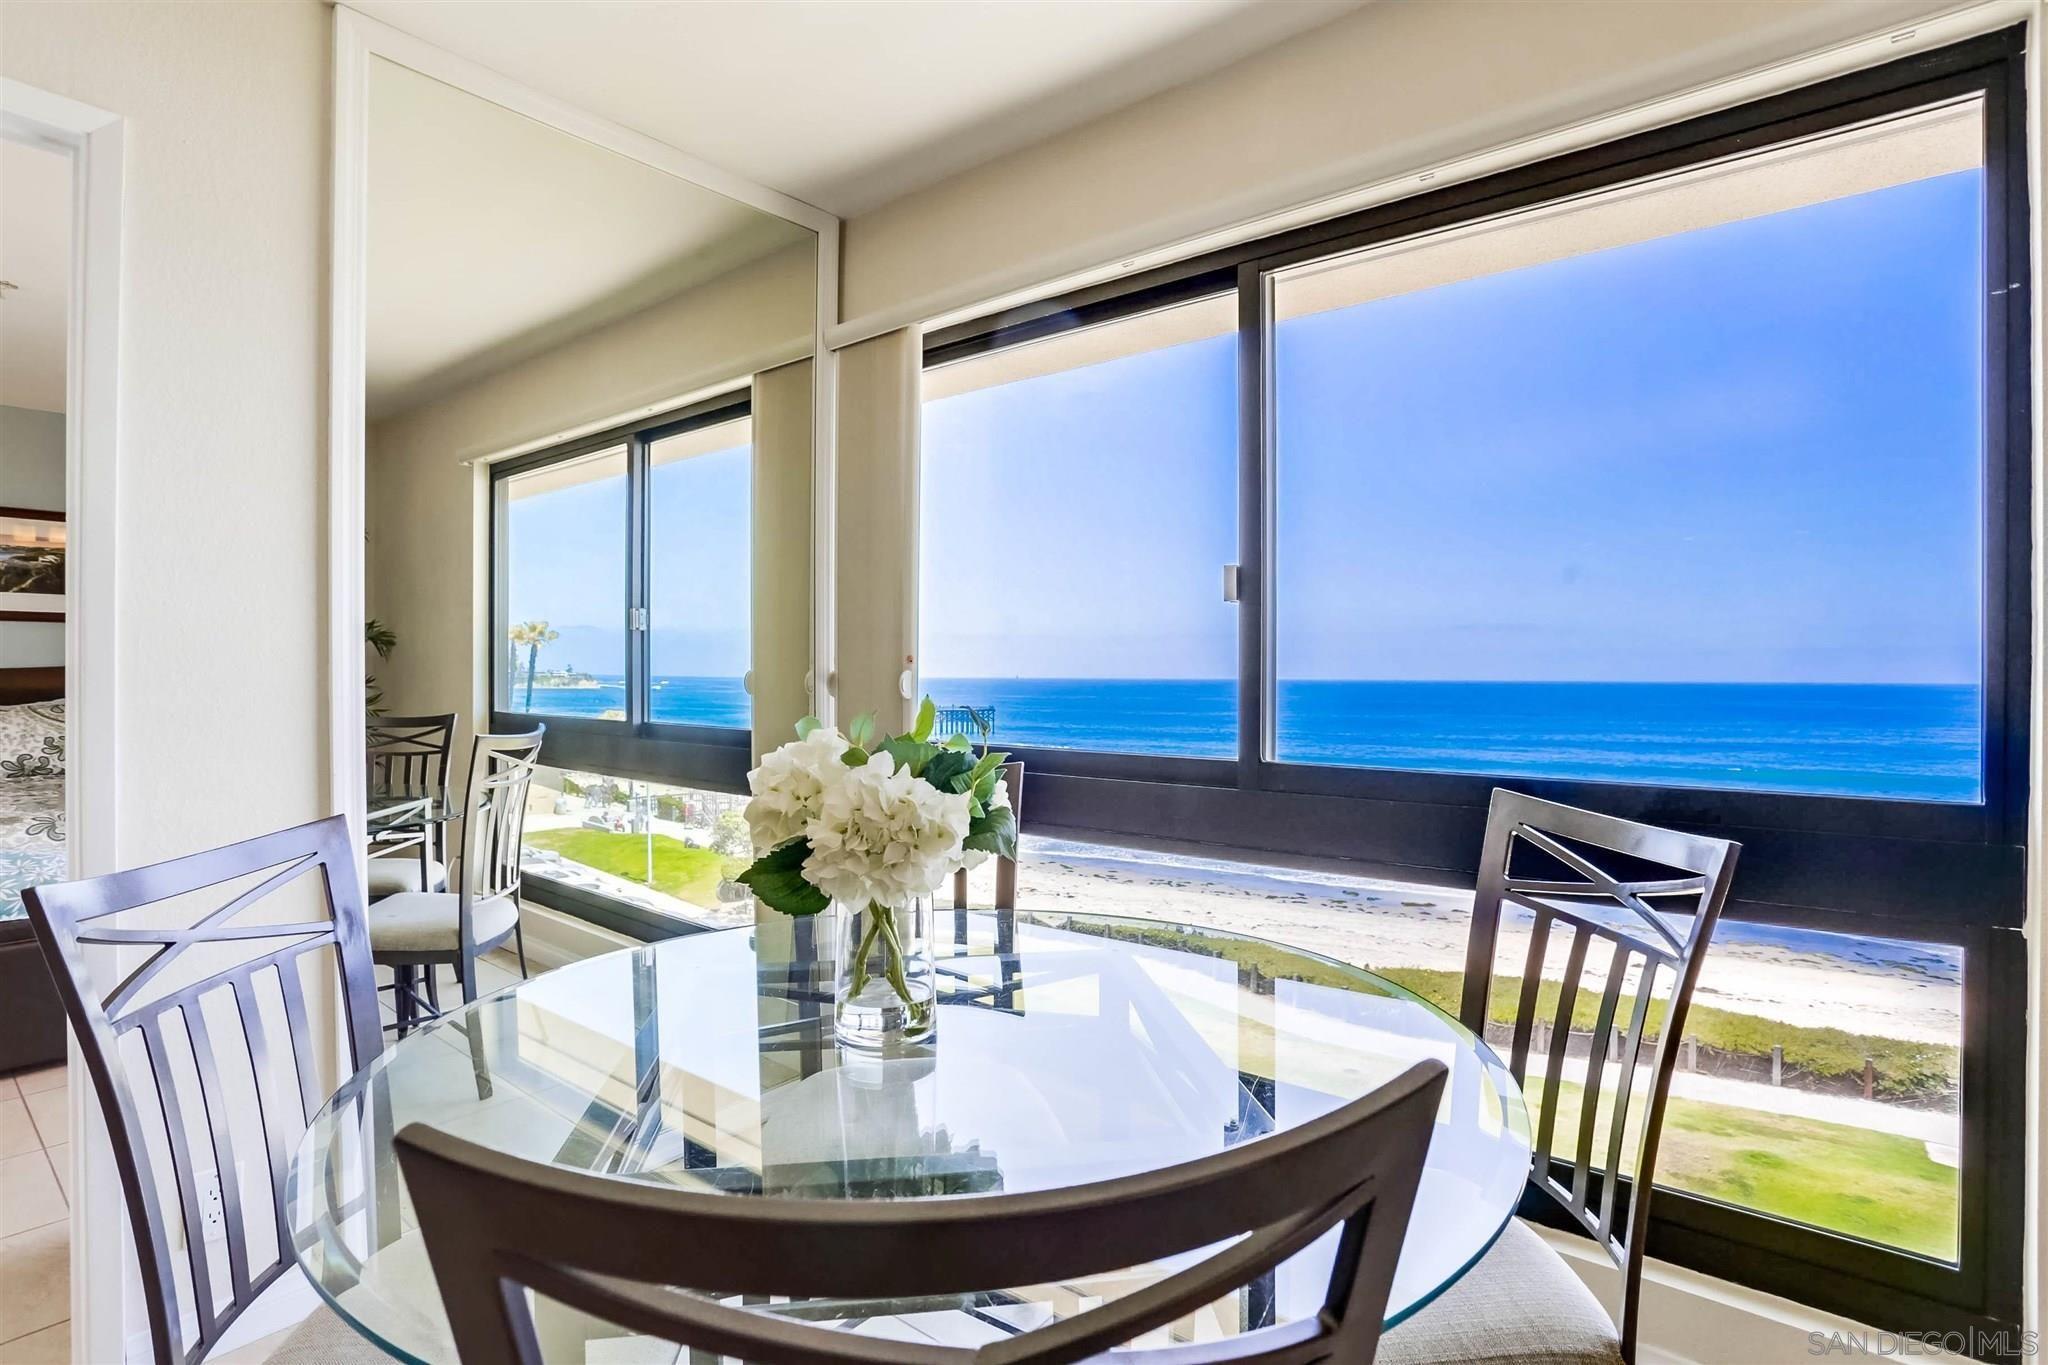 Main Photo: PACIFIC BEACH Condo for sale : 2 bedrooms : 4667 Ocean Blvd #408 in San Diego